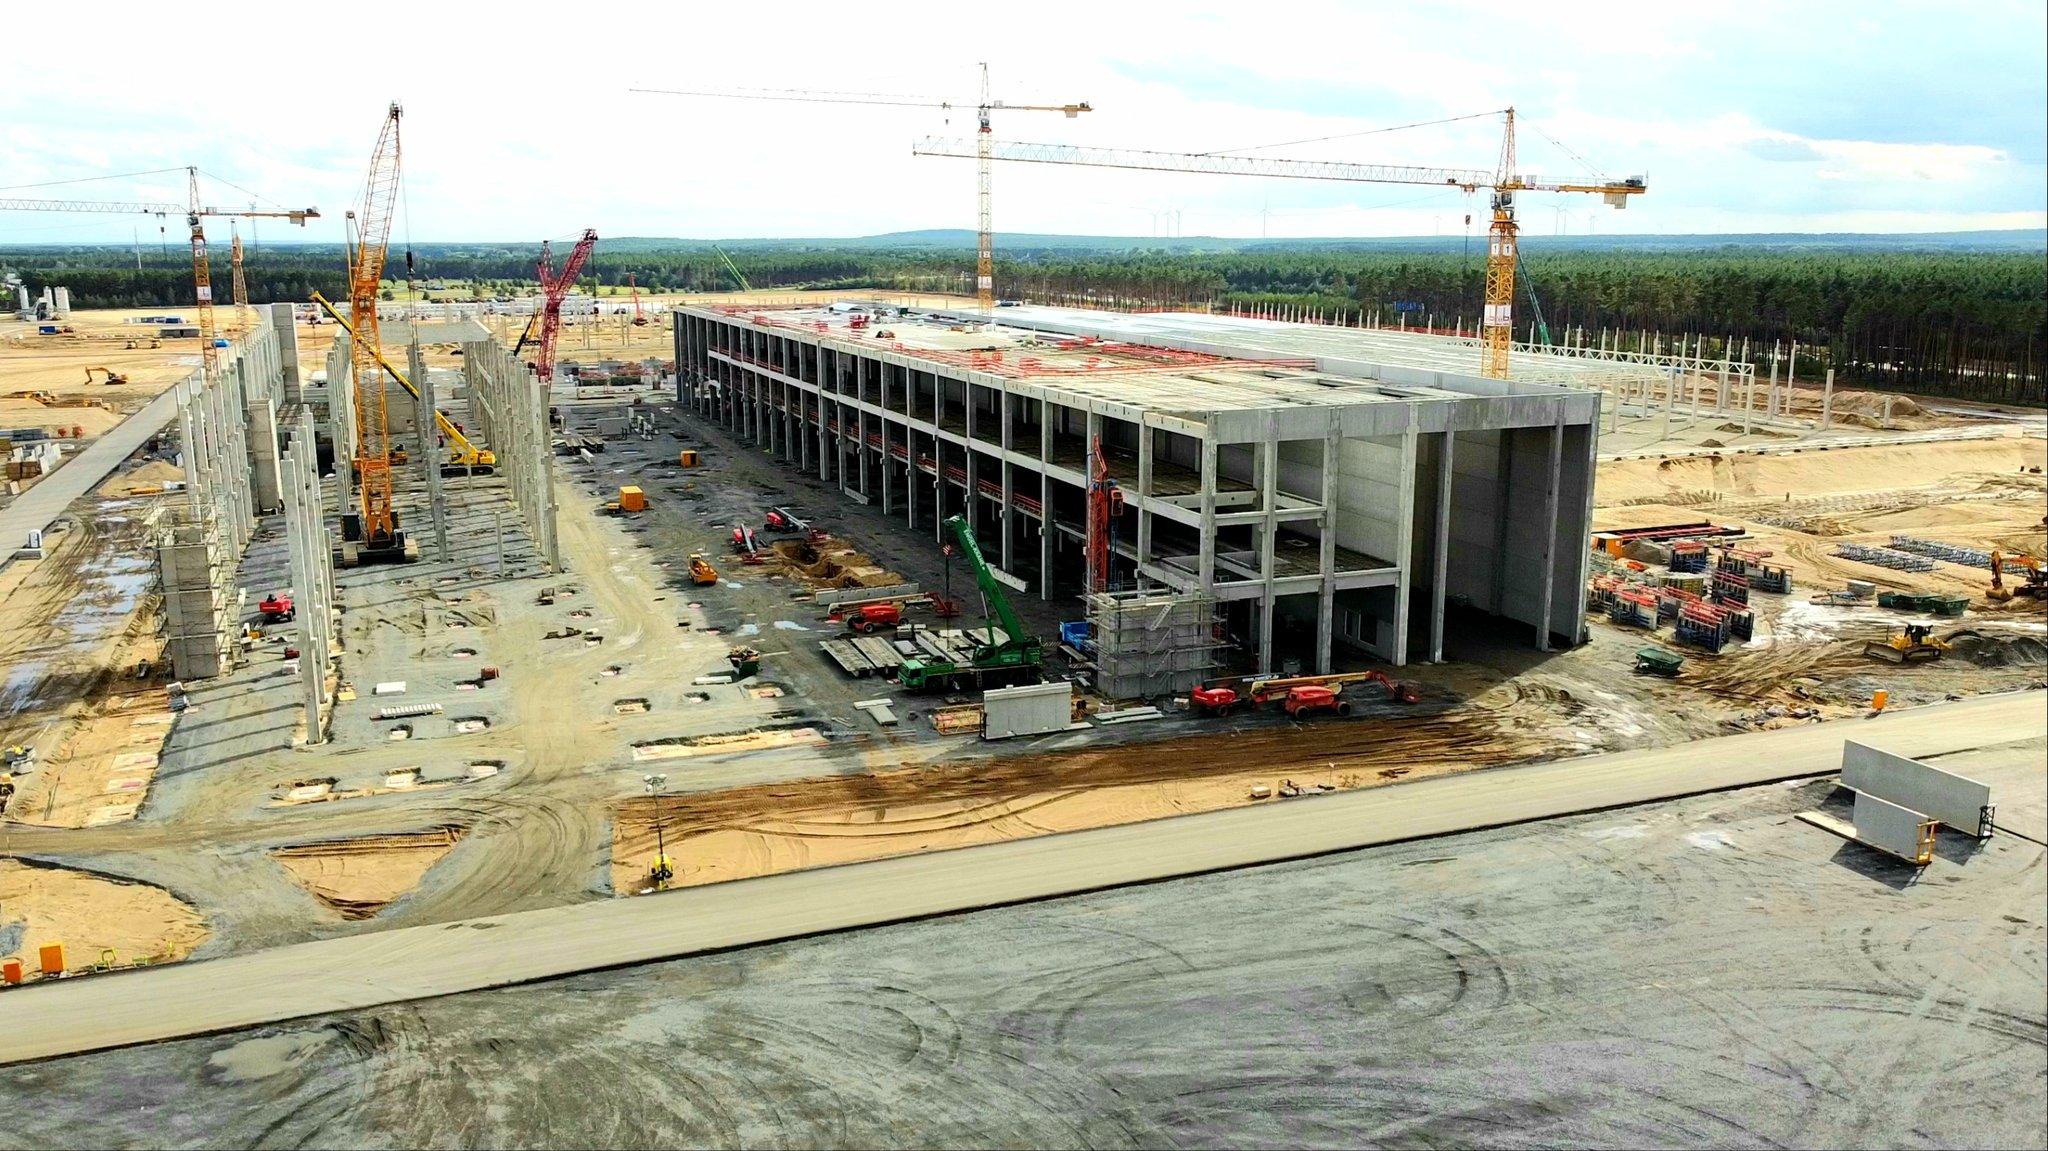 Tesla's Gigafactory in Brandenburg will create 40,000 jobs